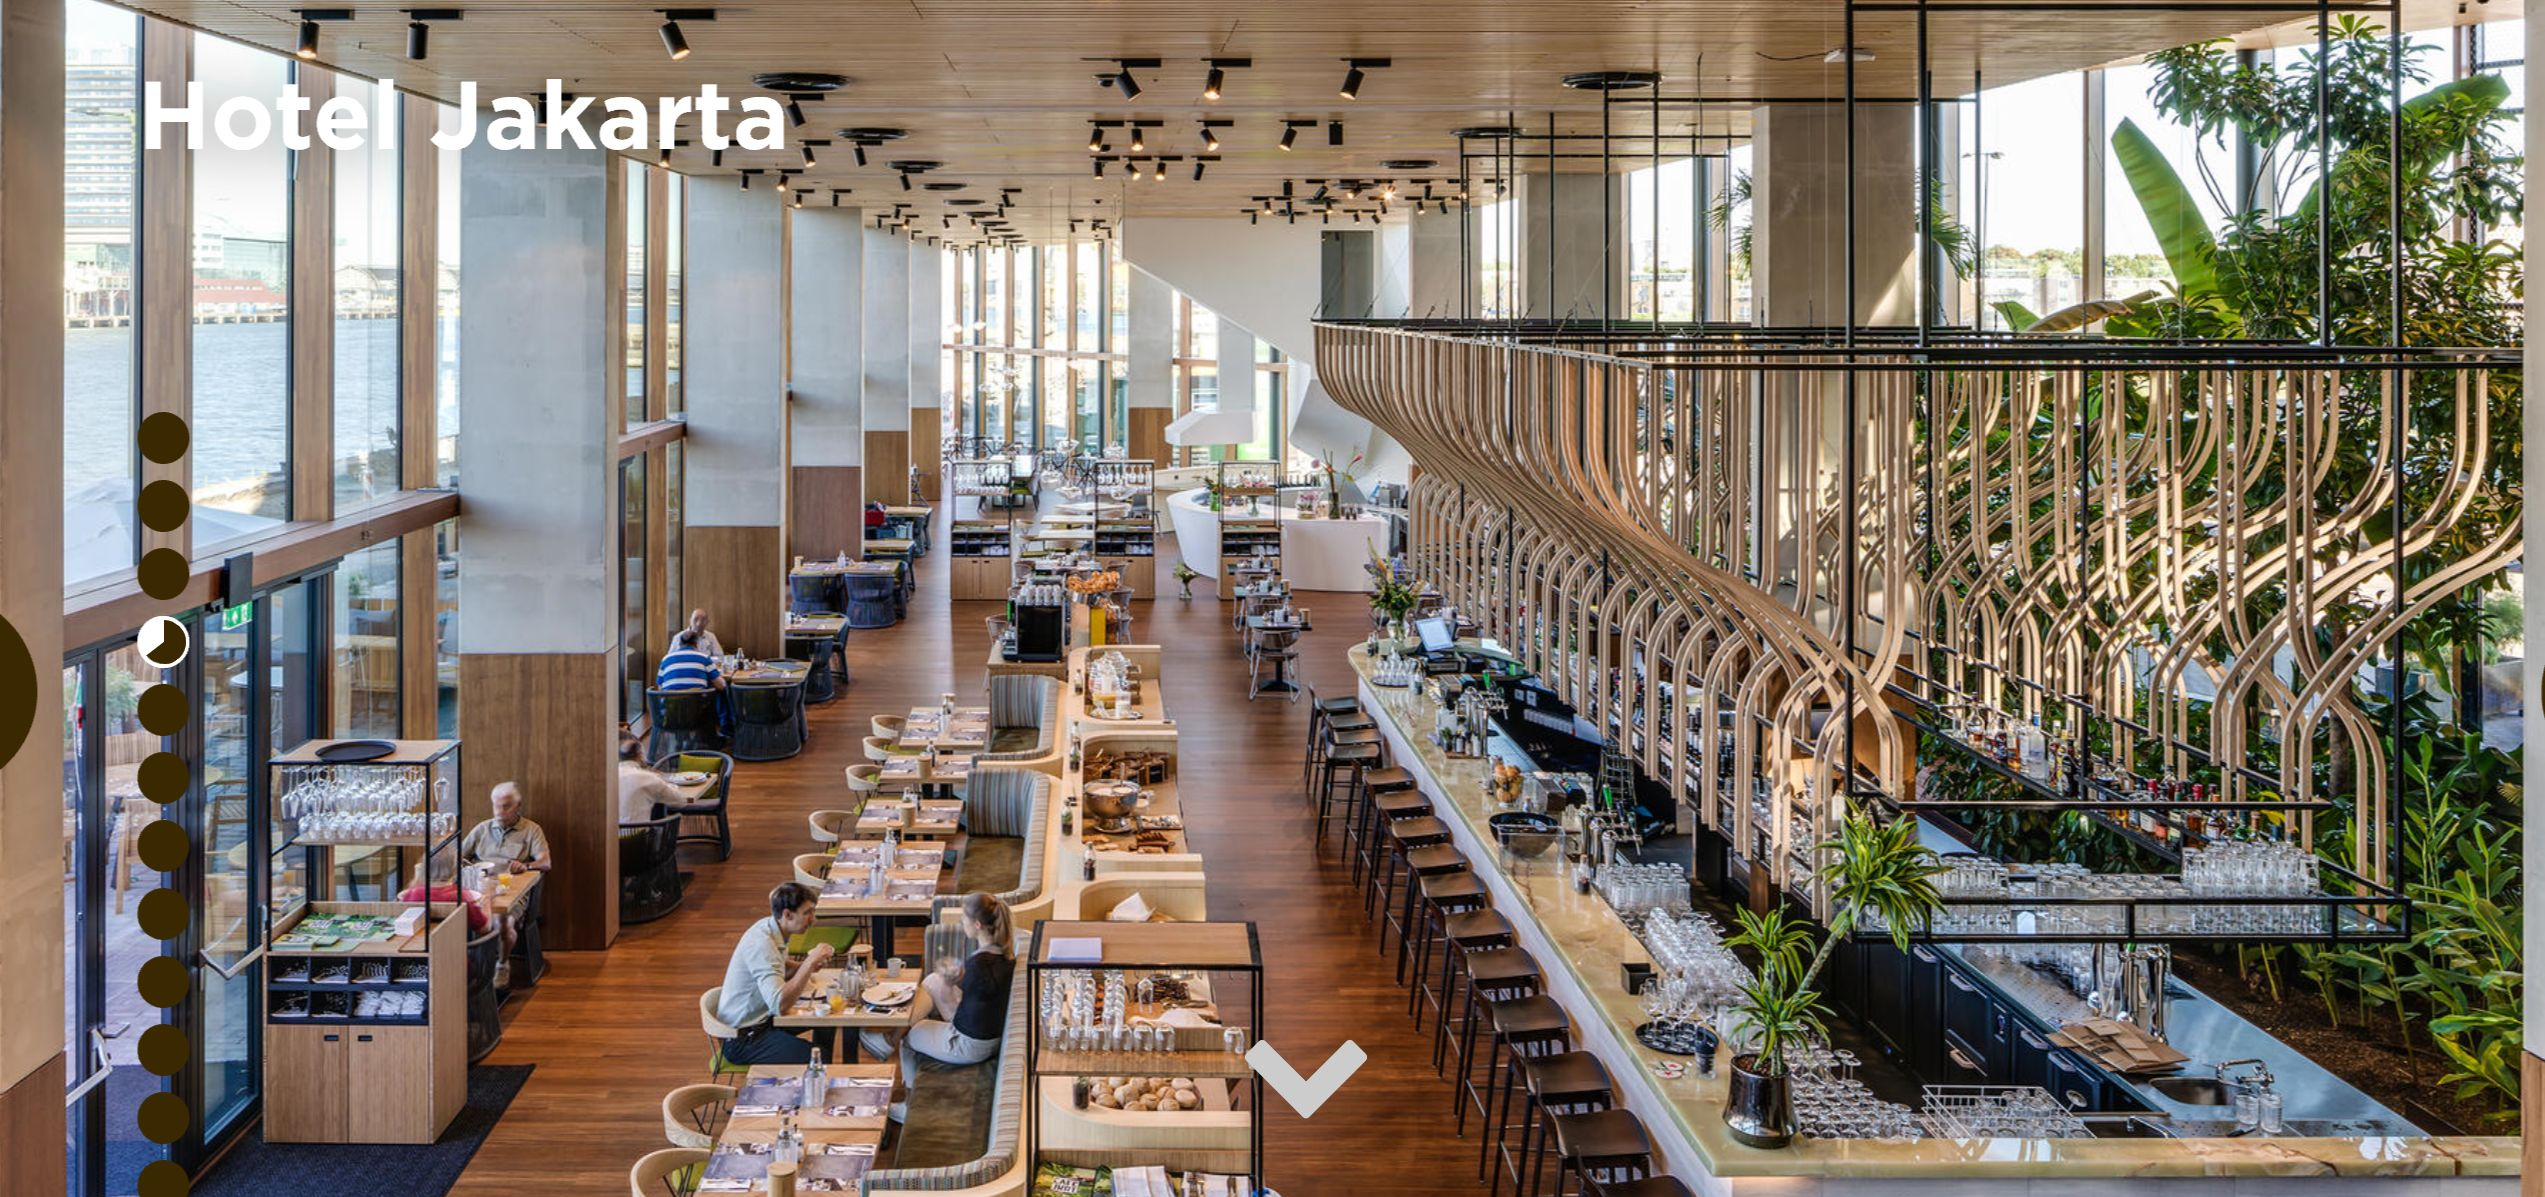 Hotel Jakarta Amsterdam helemaal met Moso Bamboe